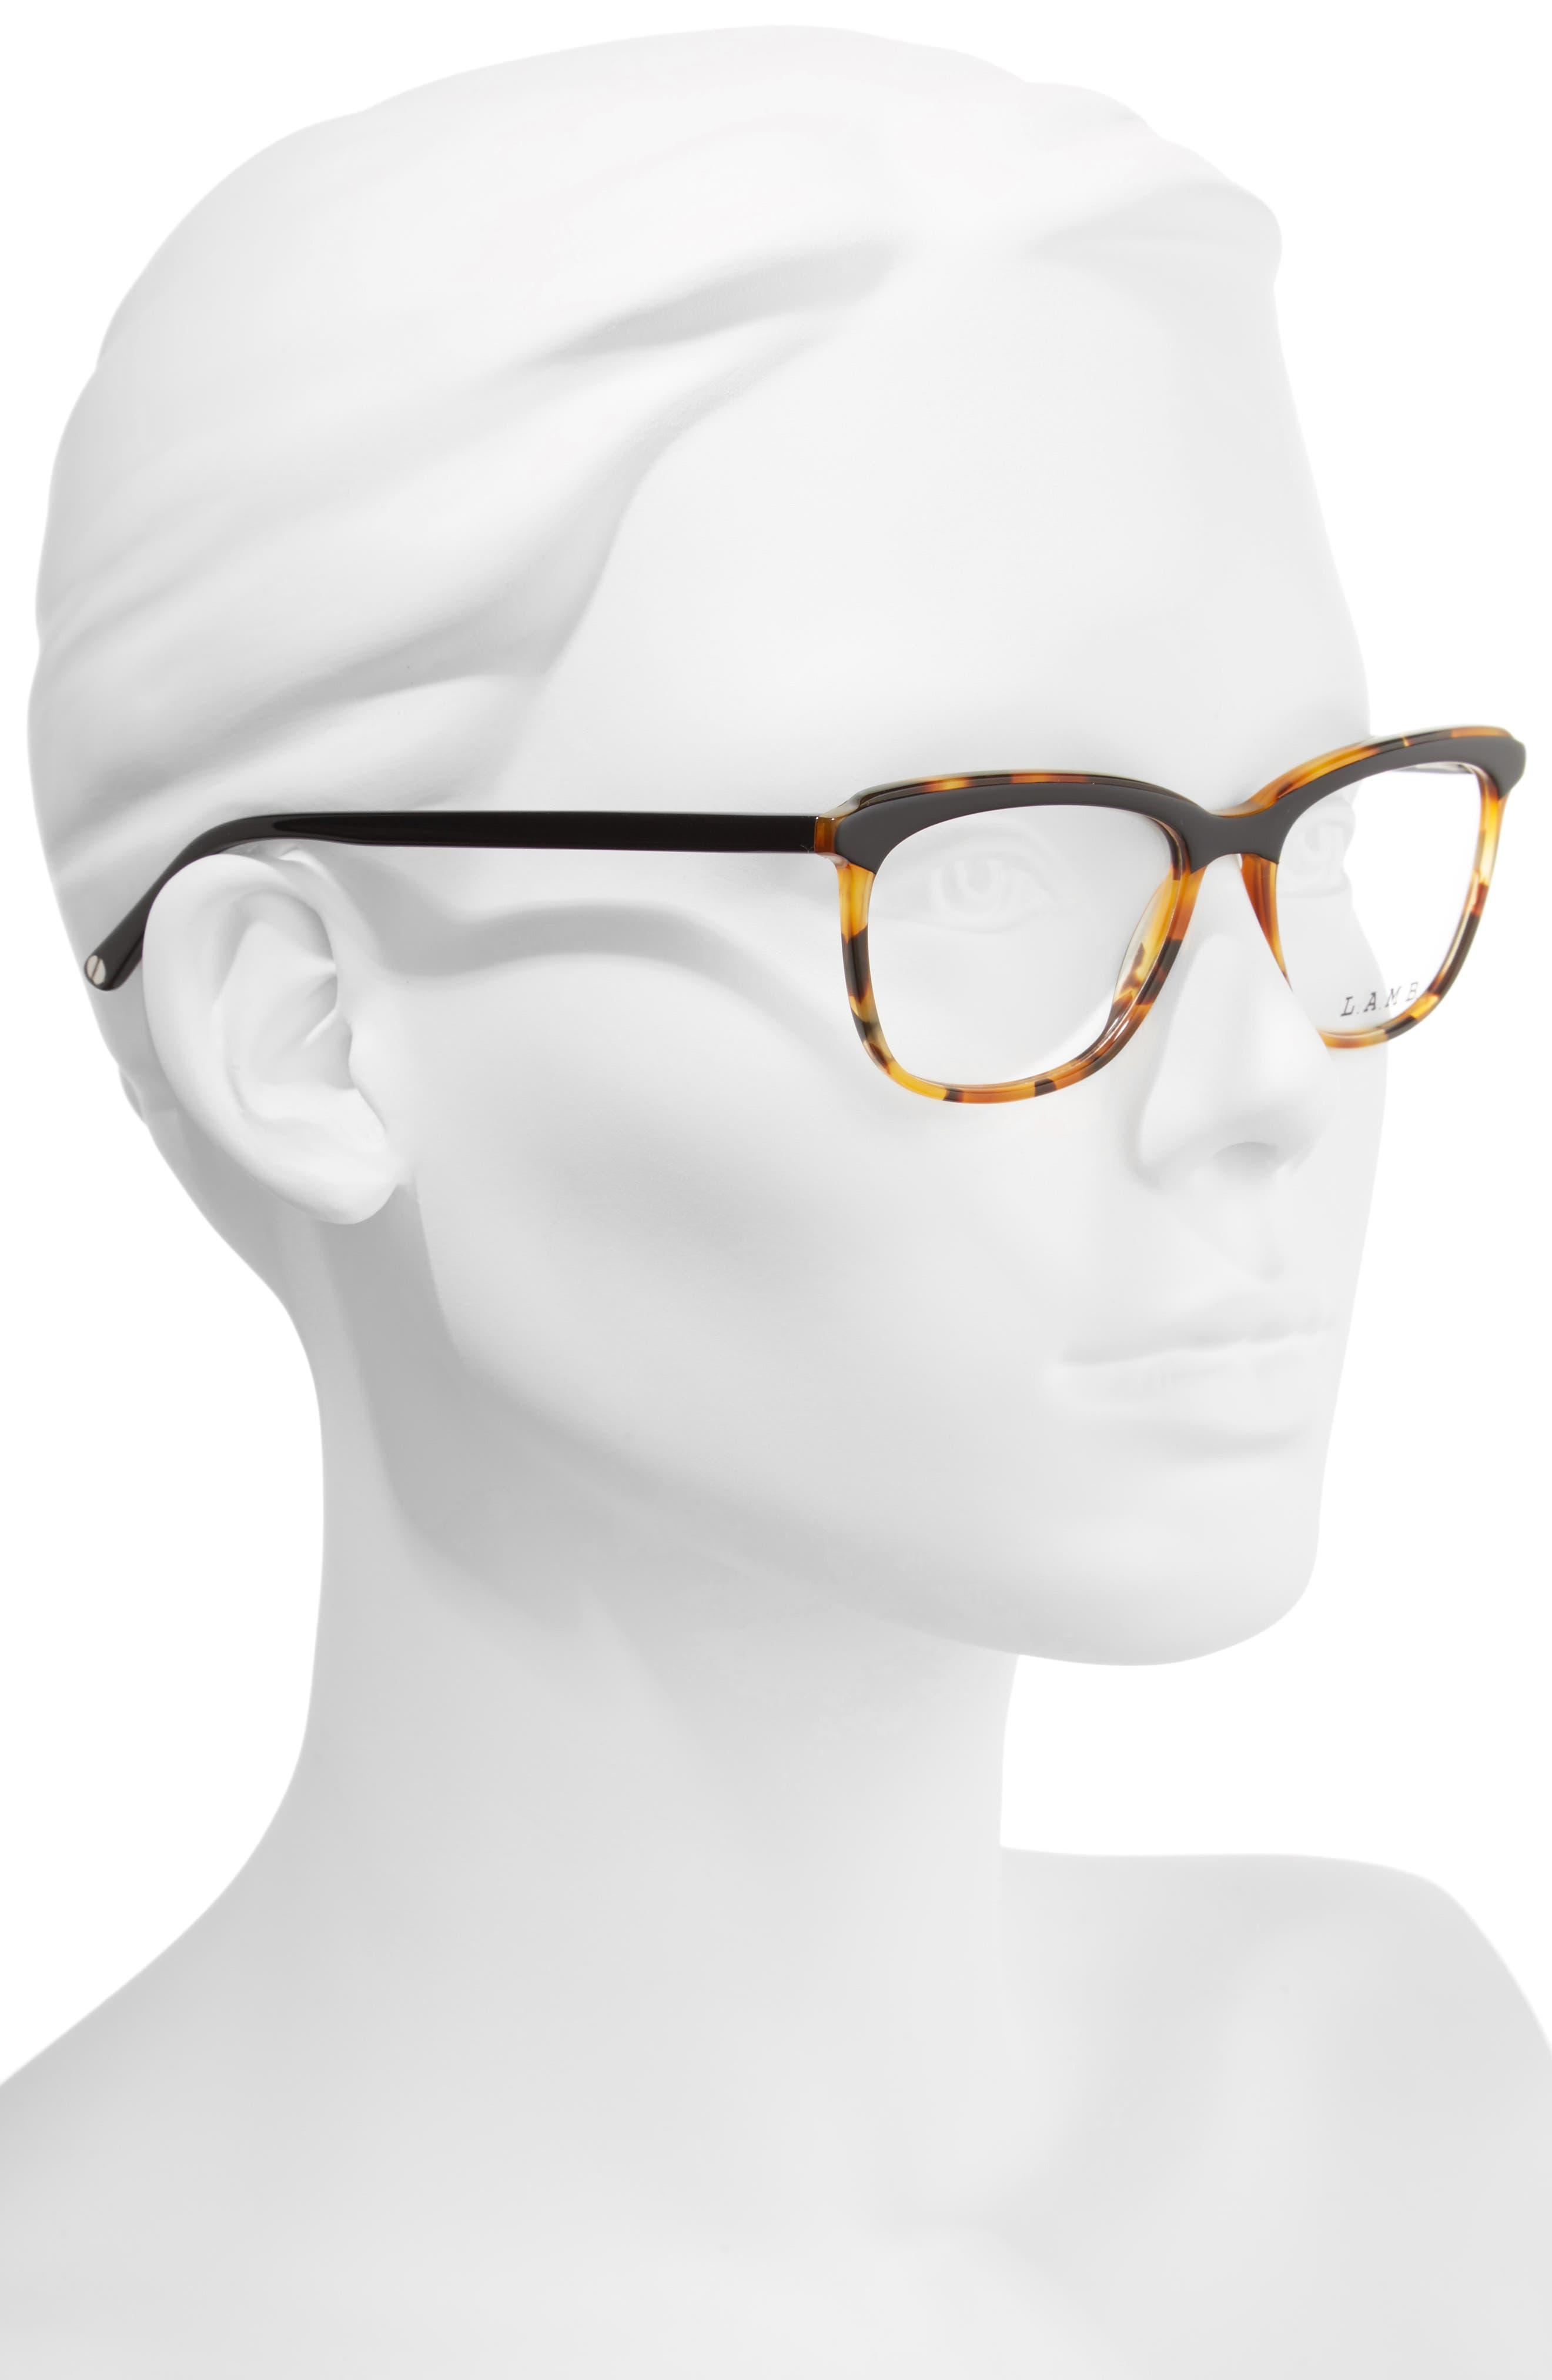 51mm Optical Square Glasses,                             Alternate thumbnail 2, color,                             001